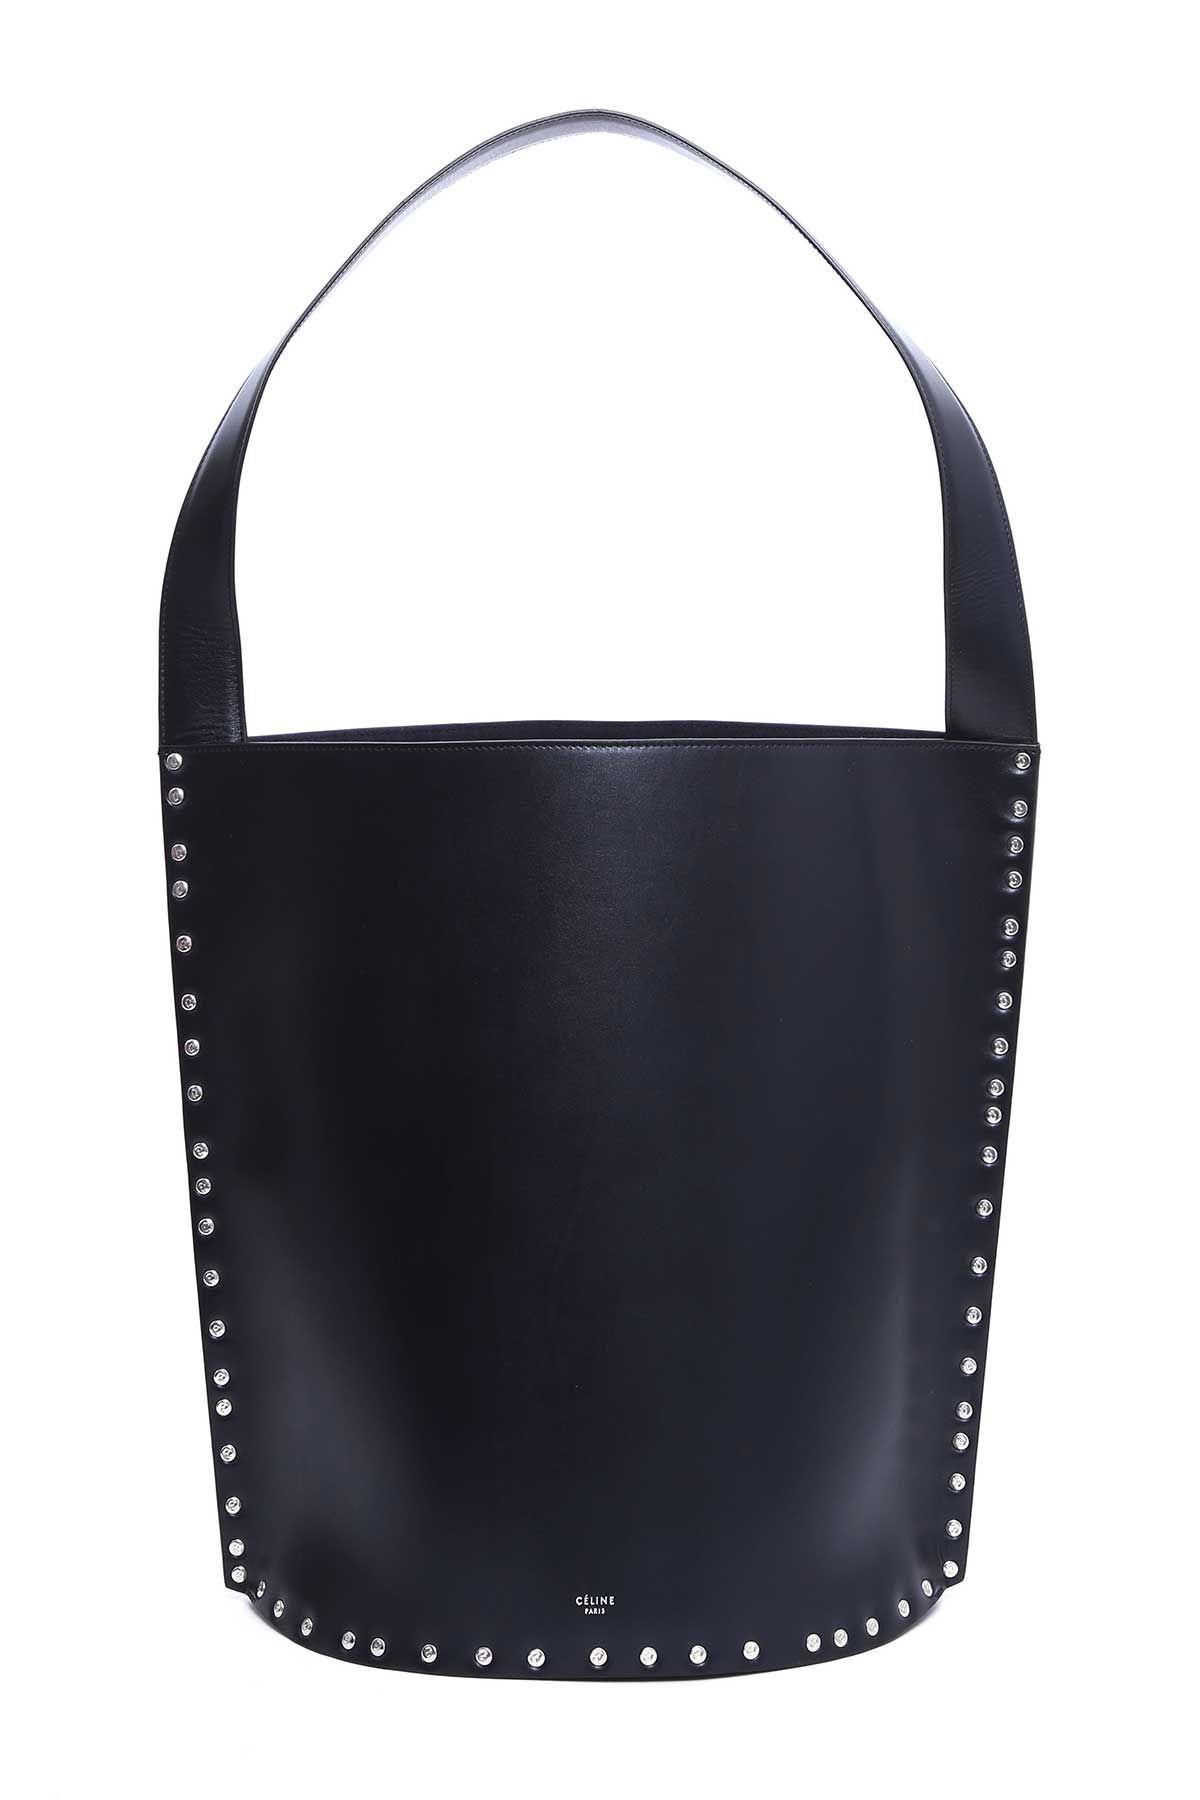 CELINE LARGE BUCKET SHOULDER BAG.  celine  bags  leather  hand bags  bucket    18be3dbf3fe52